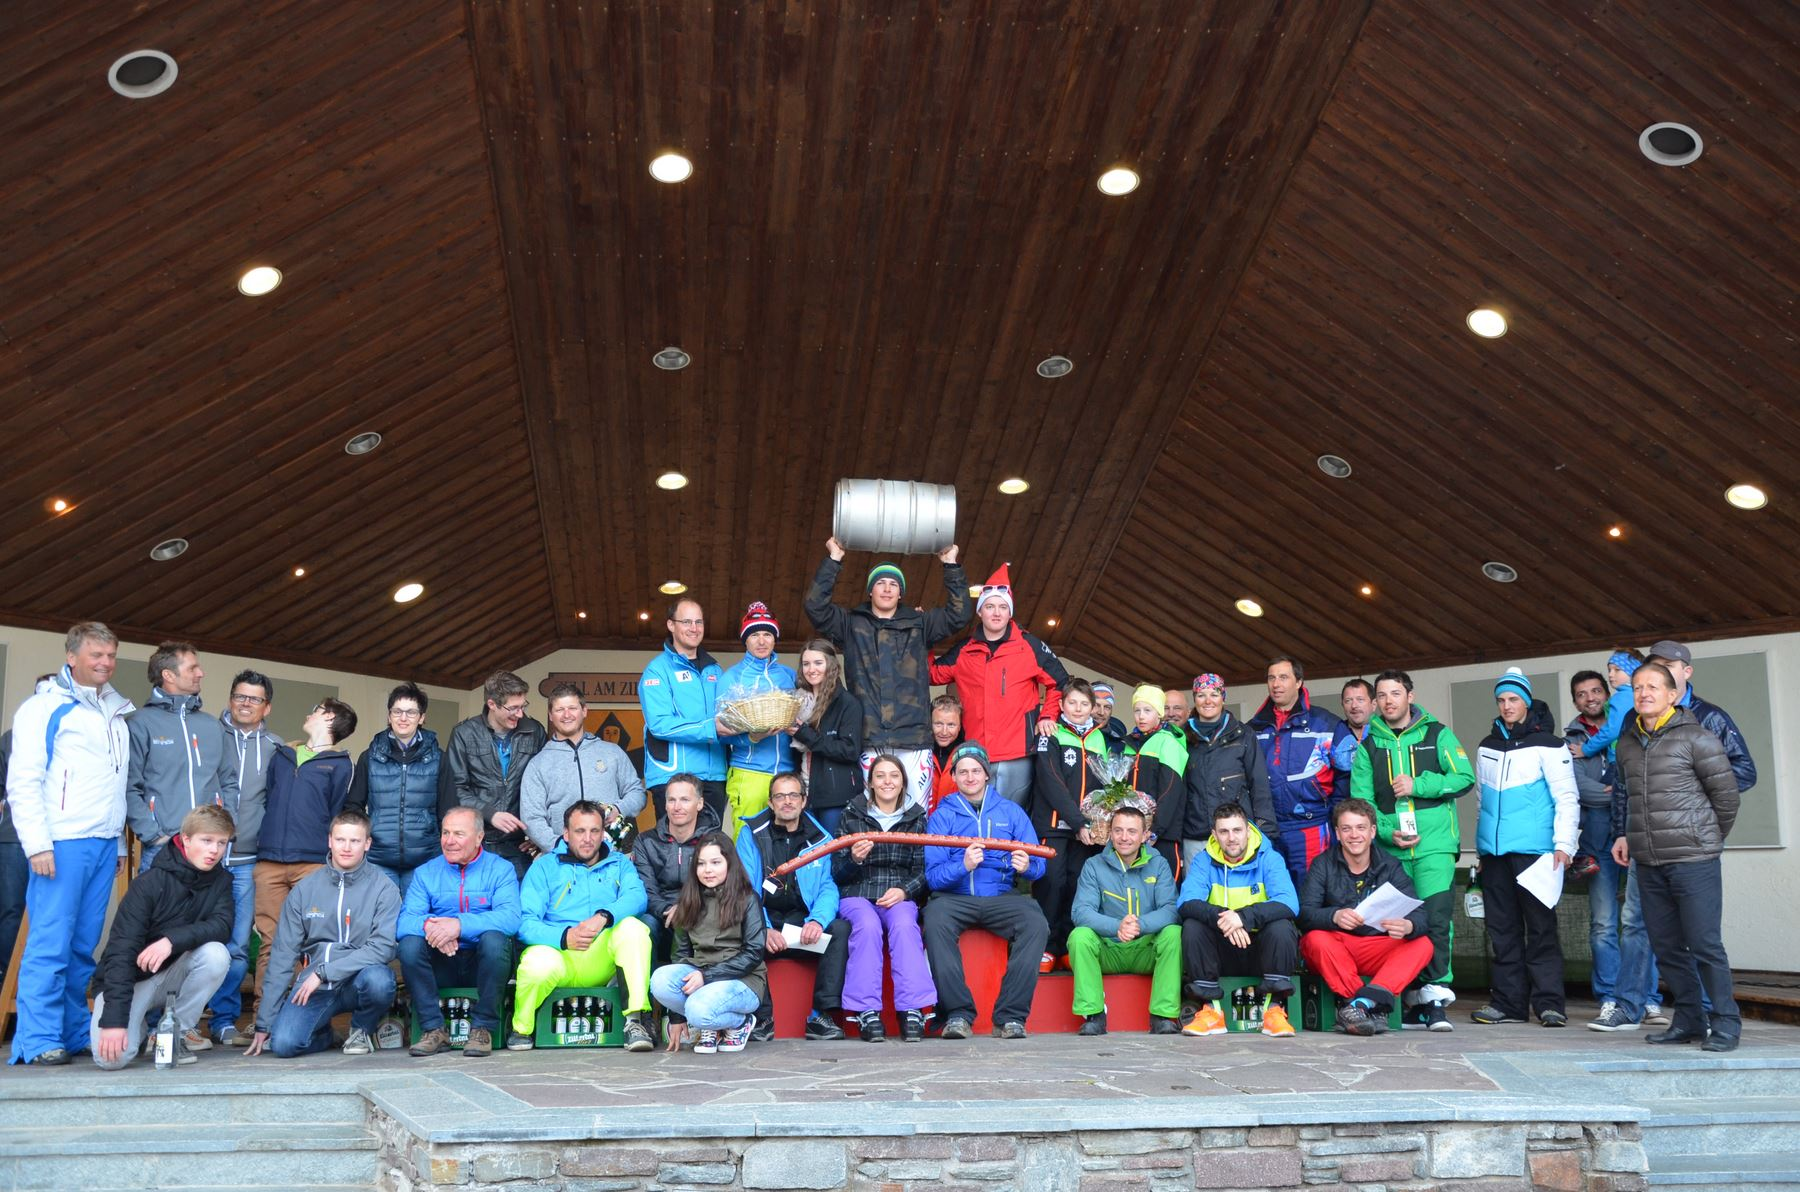 2015-03-22 BV Zillertal Skirennen 575.JPG